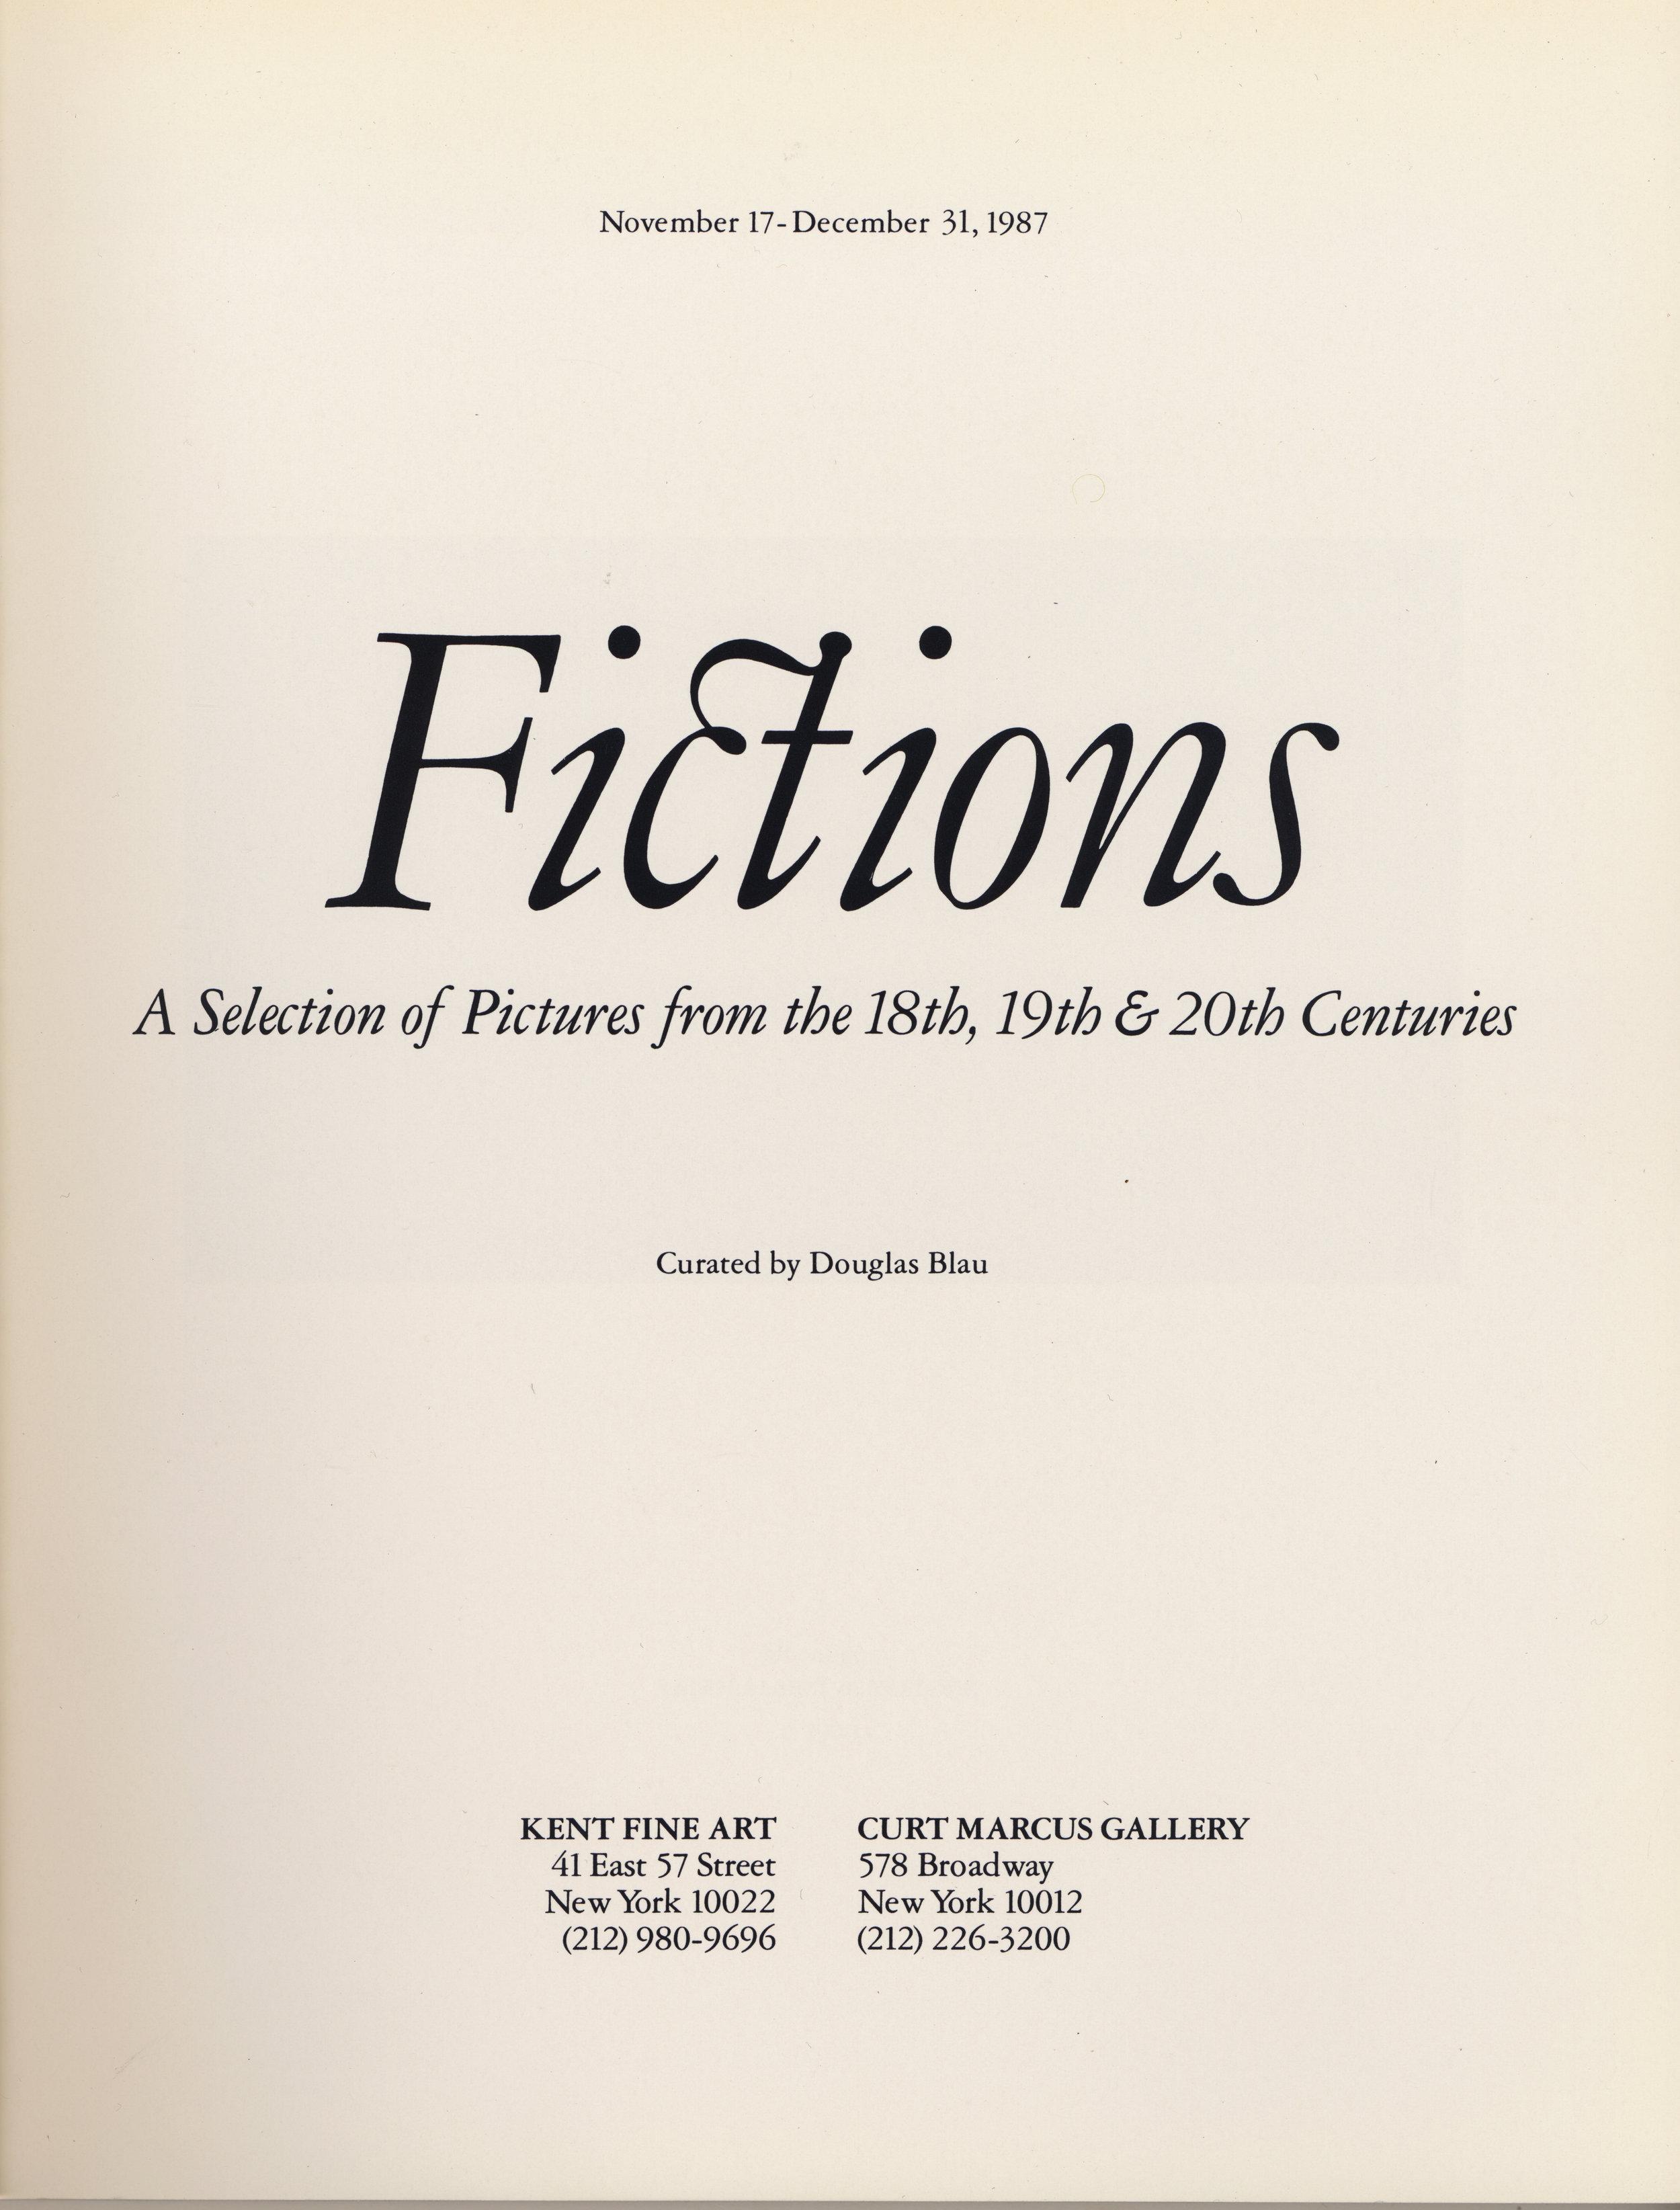 1987_FICTIONS_17 Nov - 31 Dec_PR.jpg